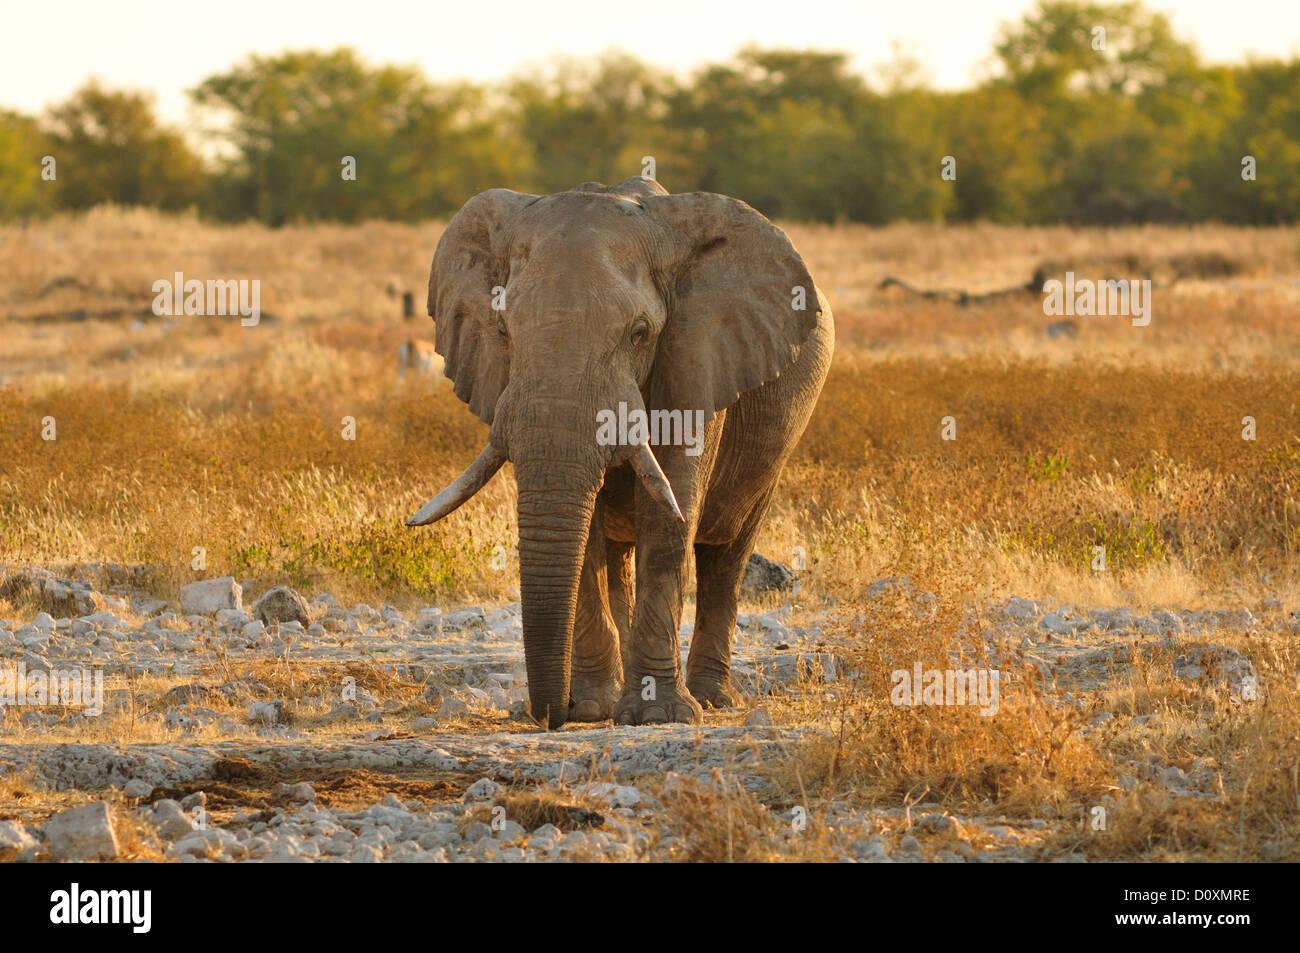 Afrika, Etosha Nationalpark, Namibia, Afrika, Tier, Sonnenuntergang, Elefant, Tier, Horizontal, Landschaft, Ebenen, Stockbild